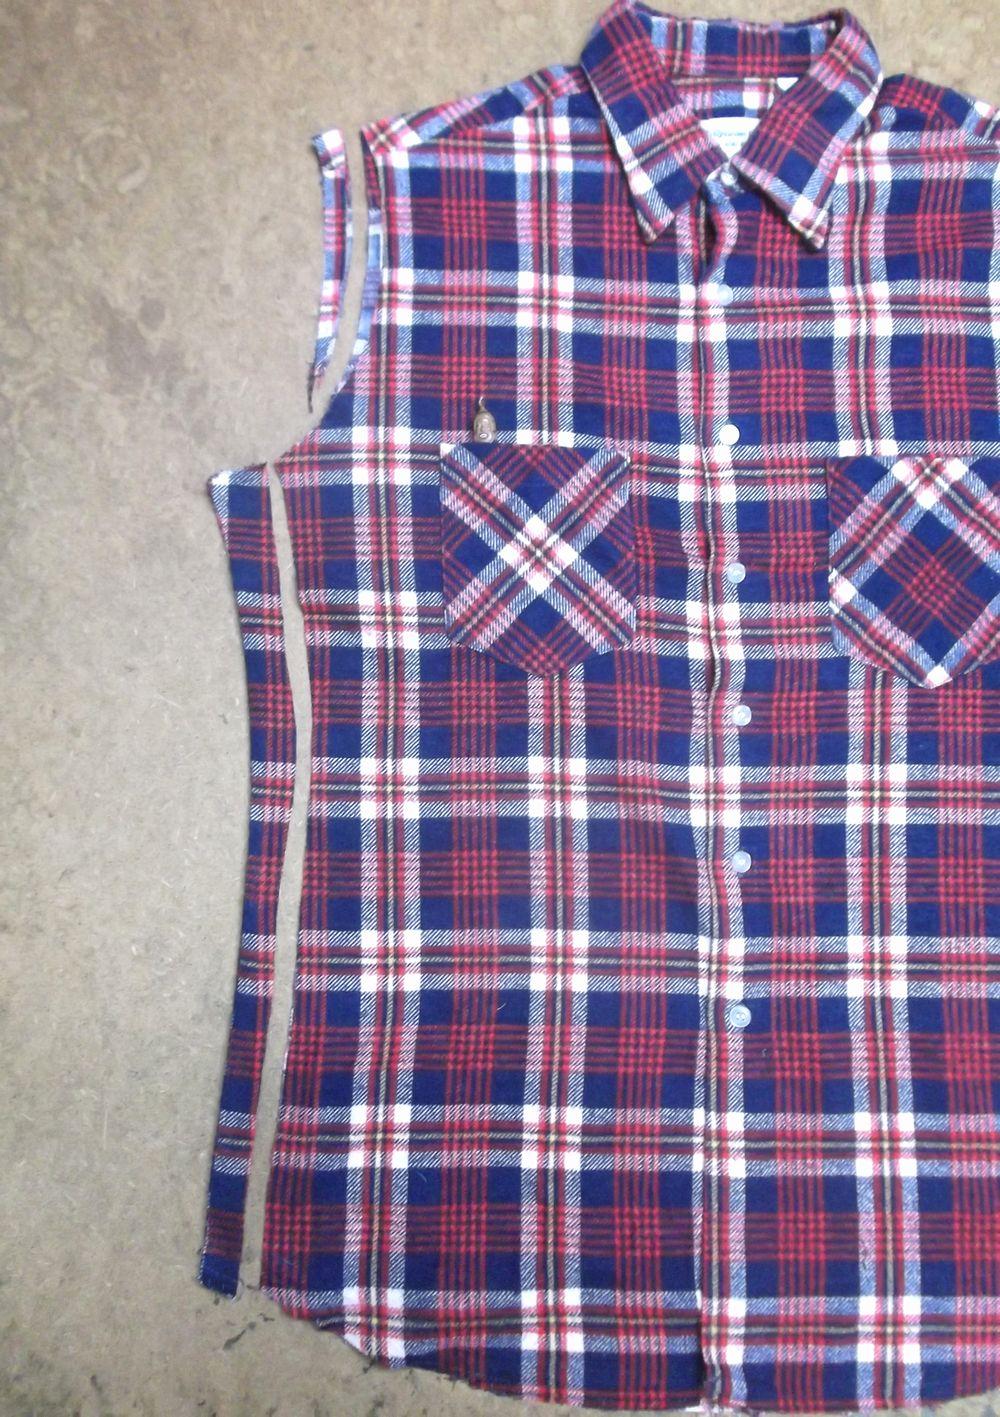 shirt298-4